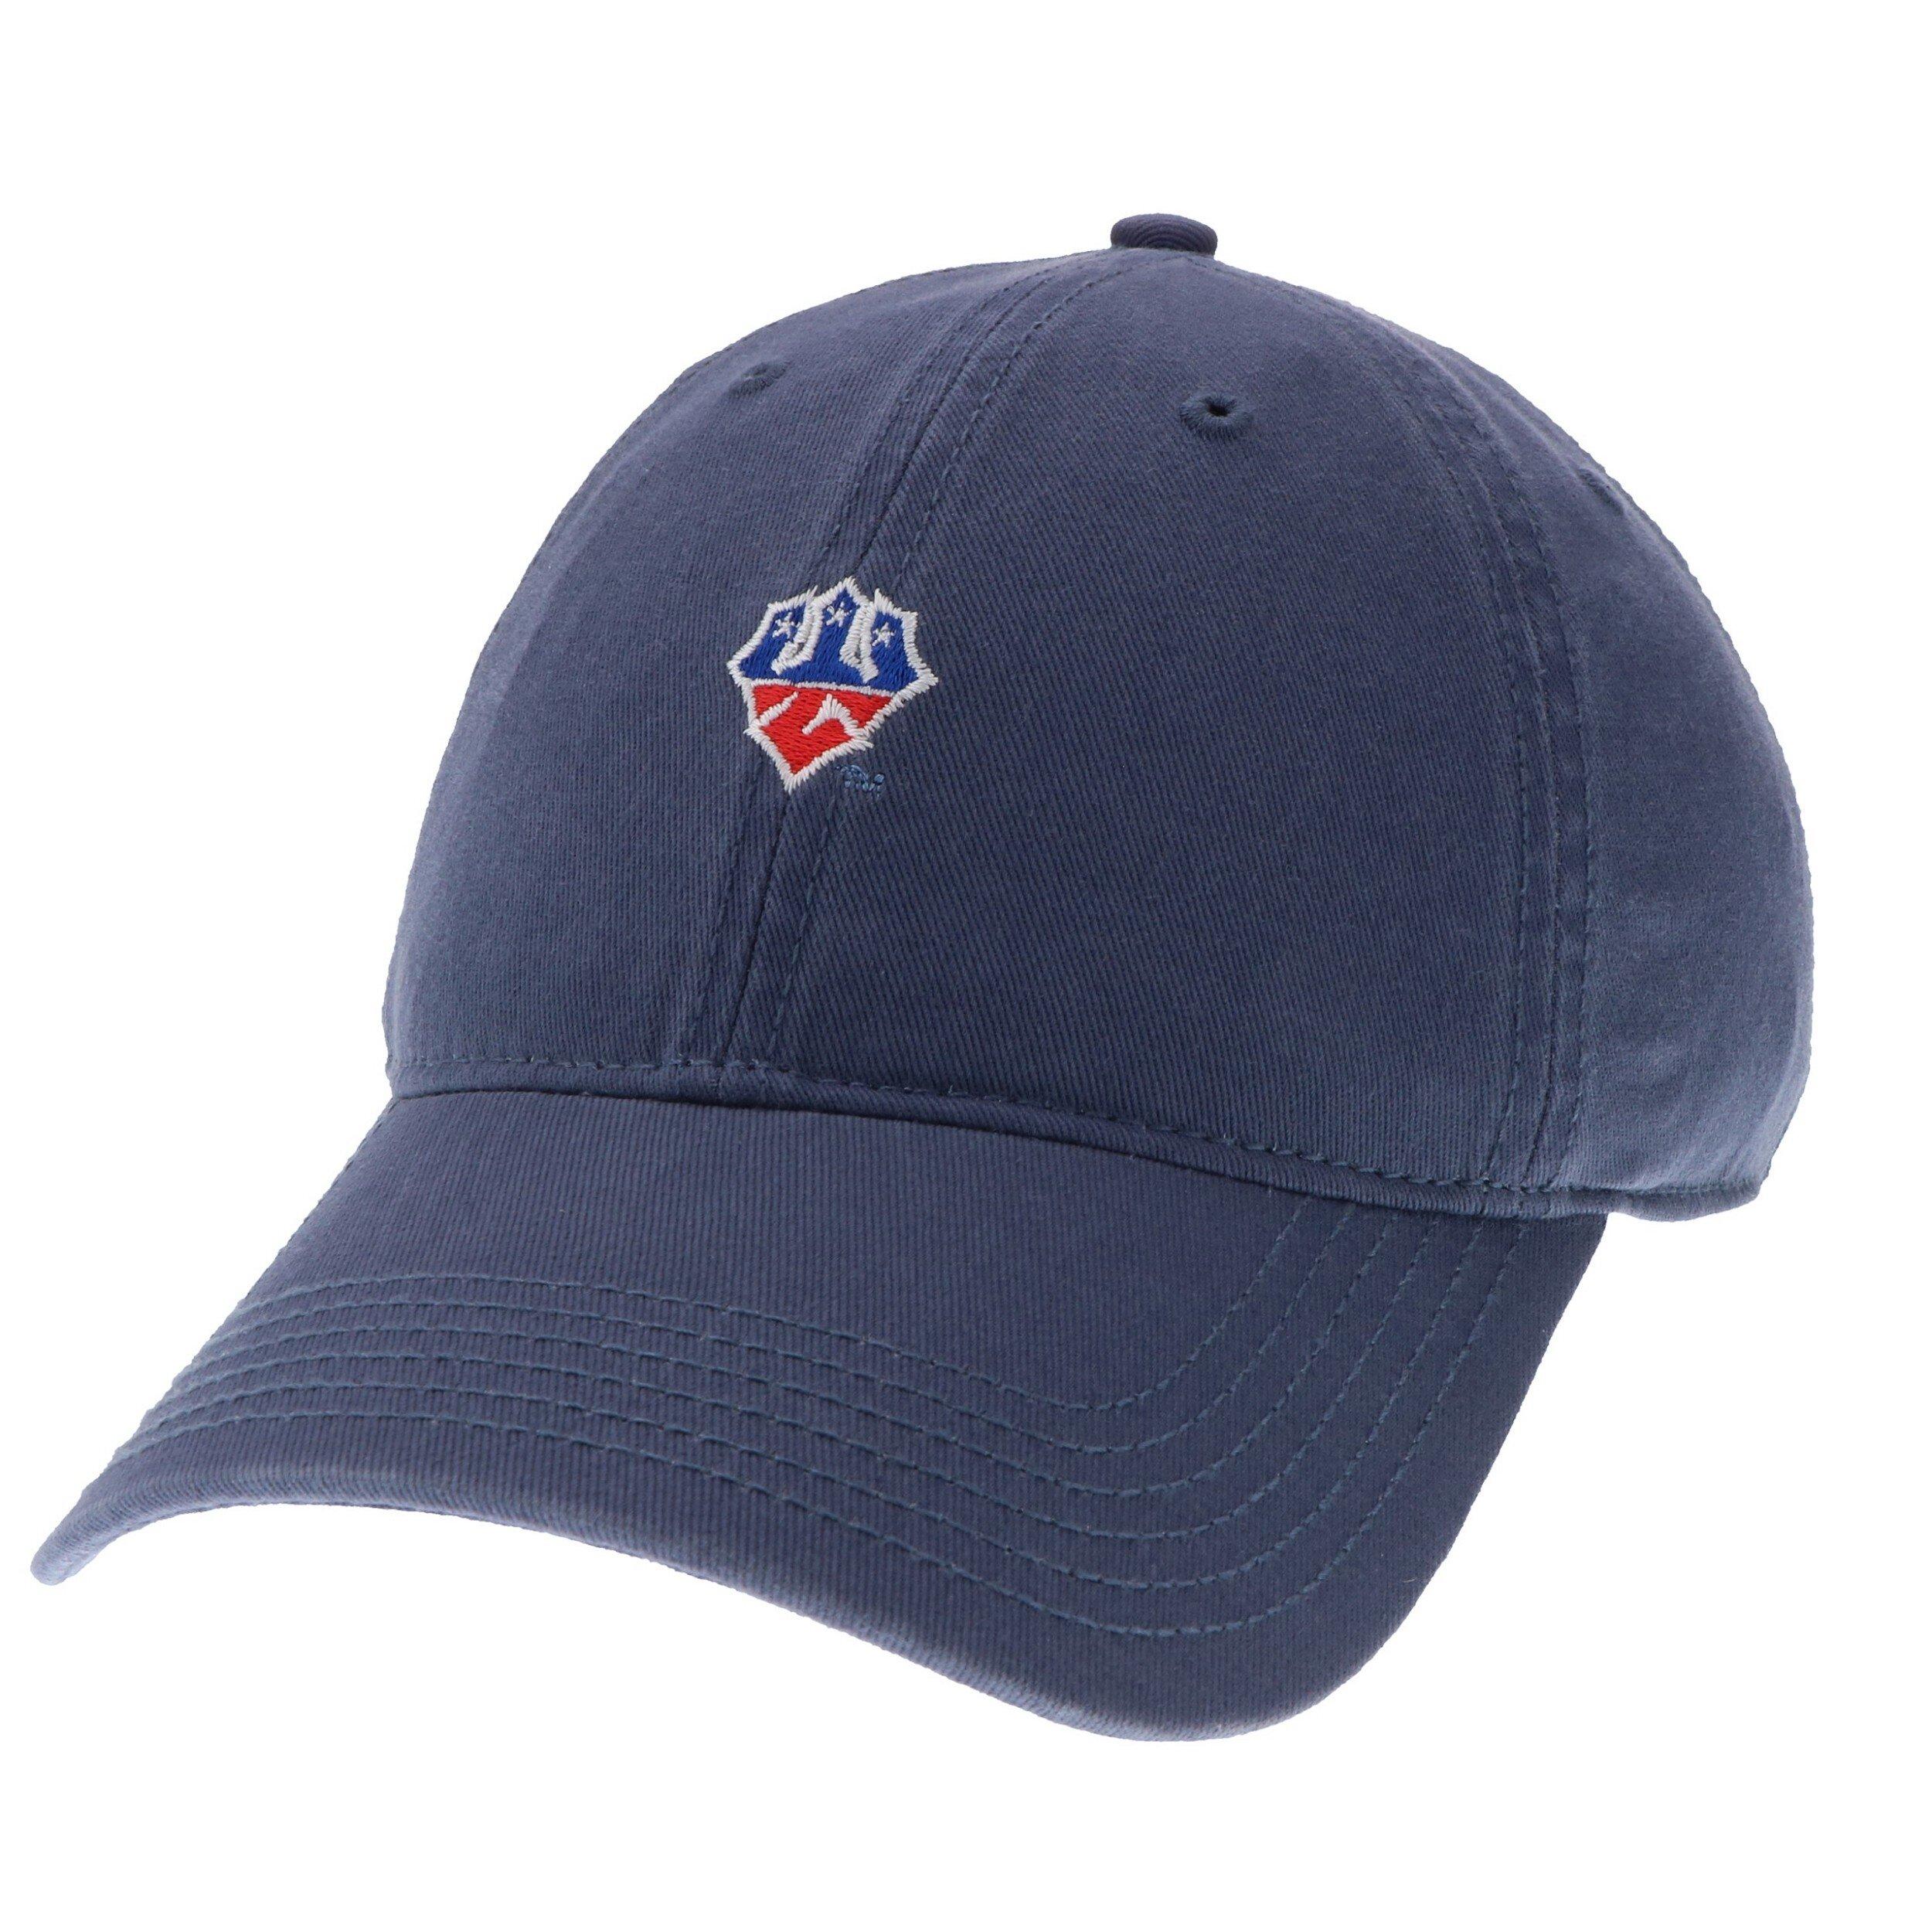 Trident Hat (Slate Blue)